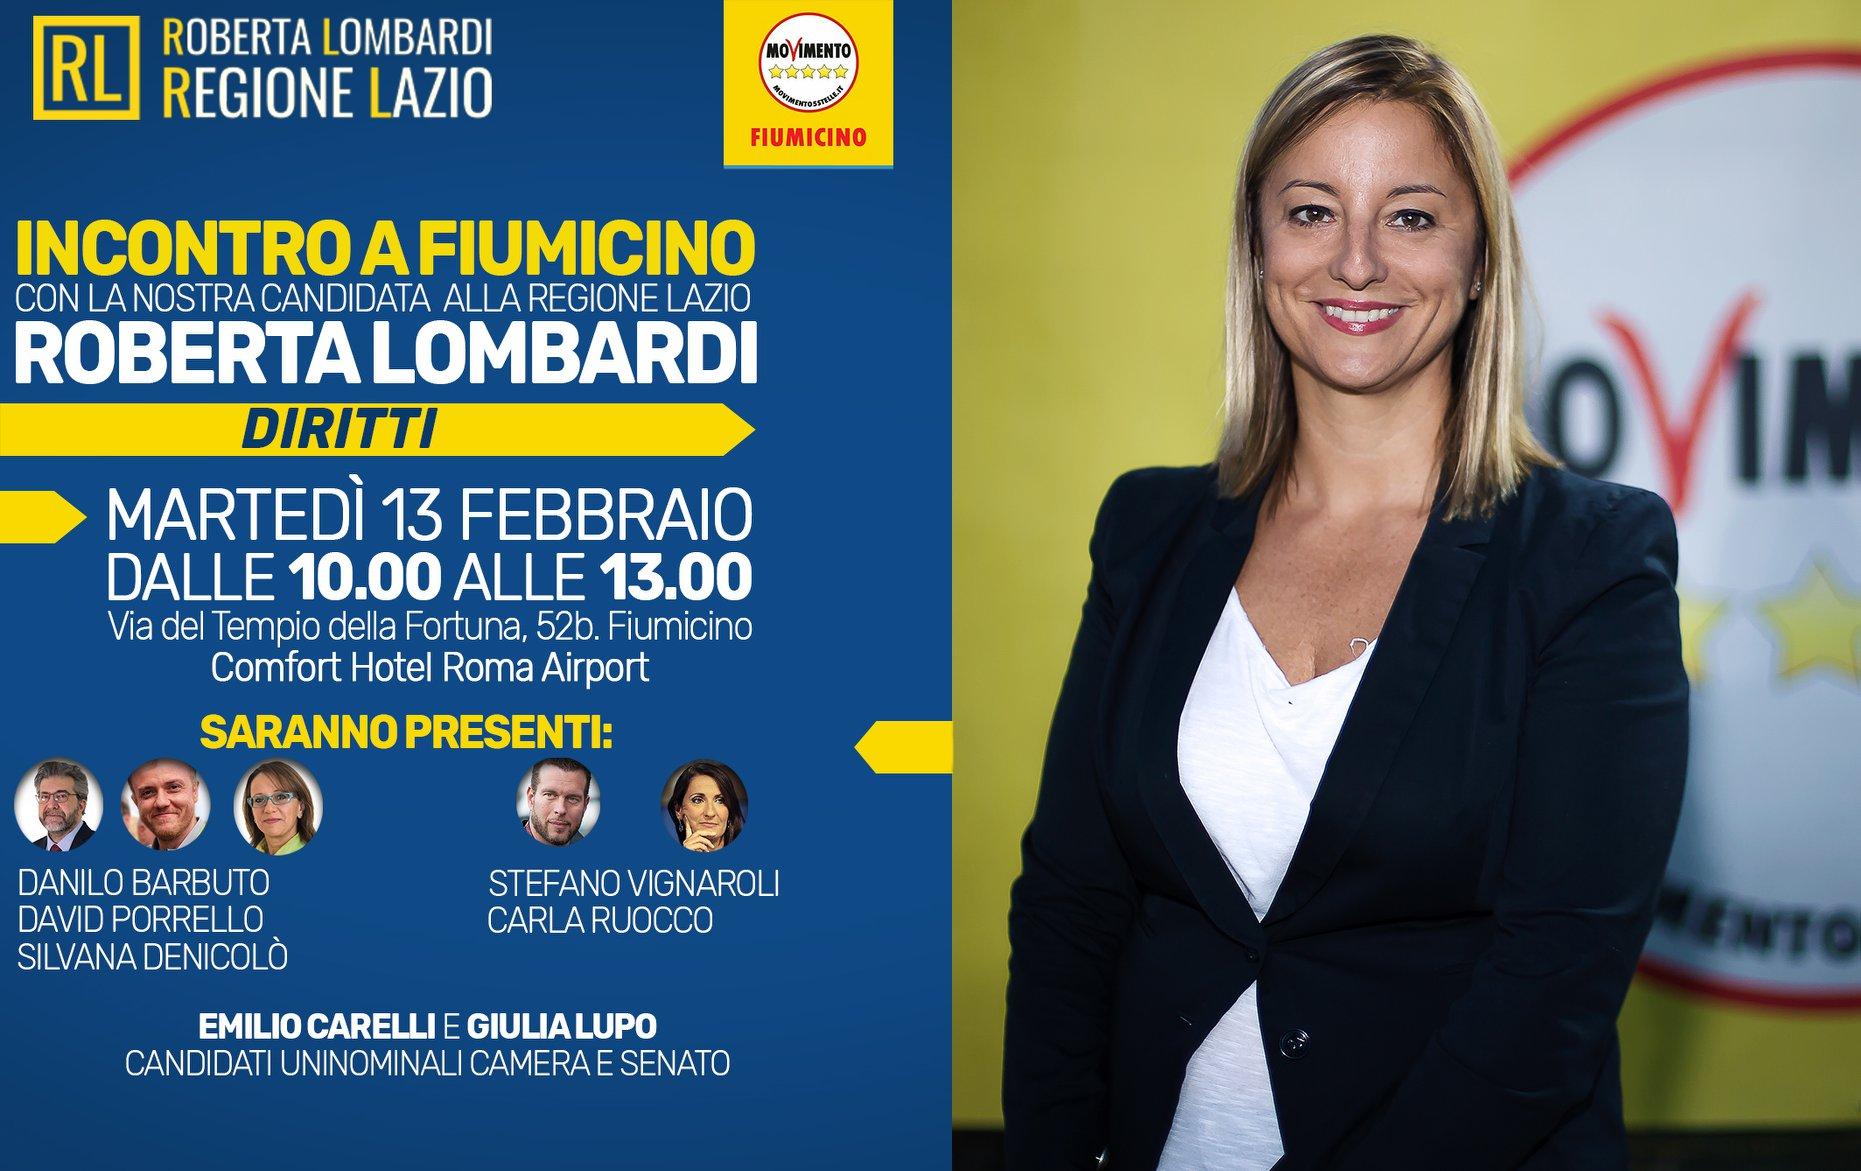 Raffaella Lombardi M5s